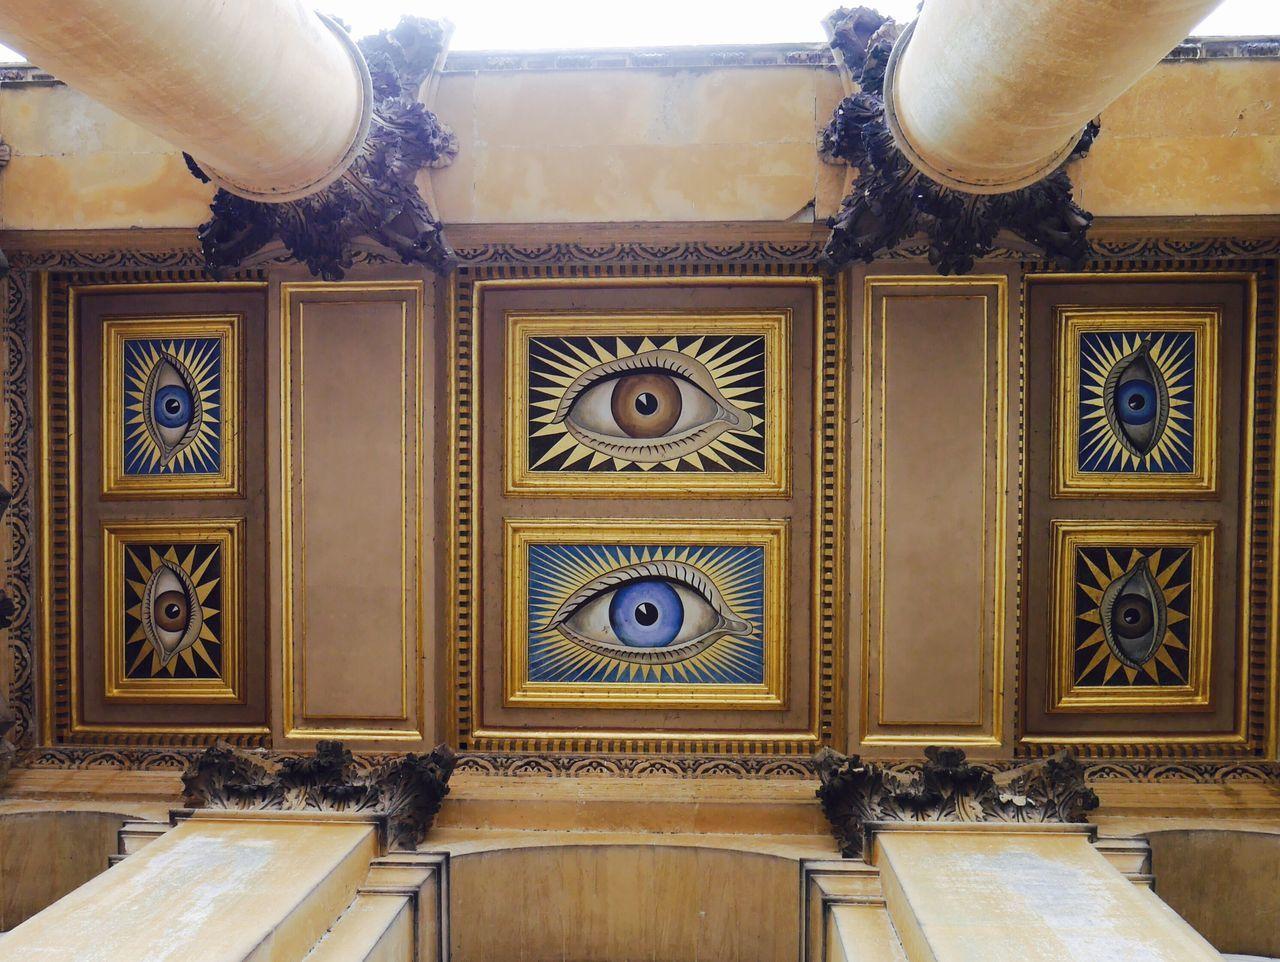 London Lifestyle Ceiling Big Eyes Bigbrotheriswatchingyou England Traveling Architecture Blenheimpalace Watching Mural